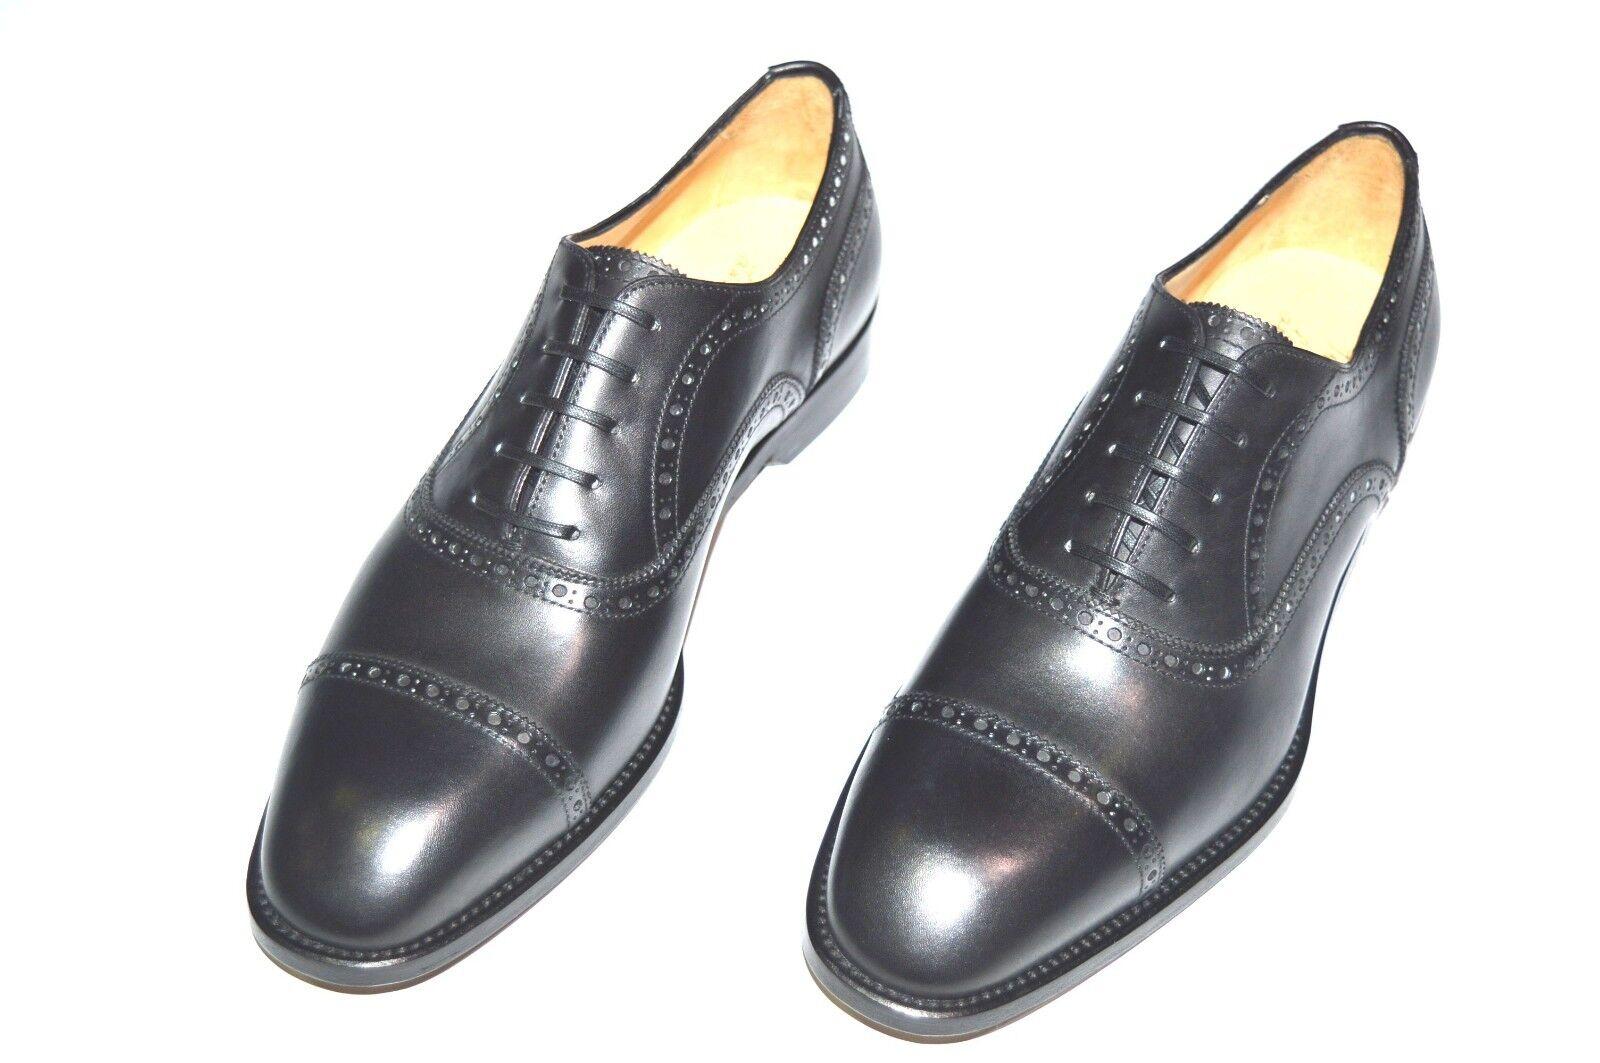 New PAOLO SCAFORA Dress Leather Luxury Luxury Luxury shoes Size Eu 40 Uk 6 Us 7 Cod 8 a1fbd6